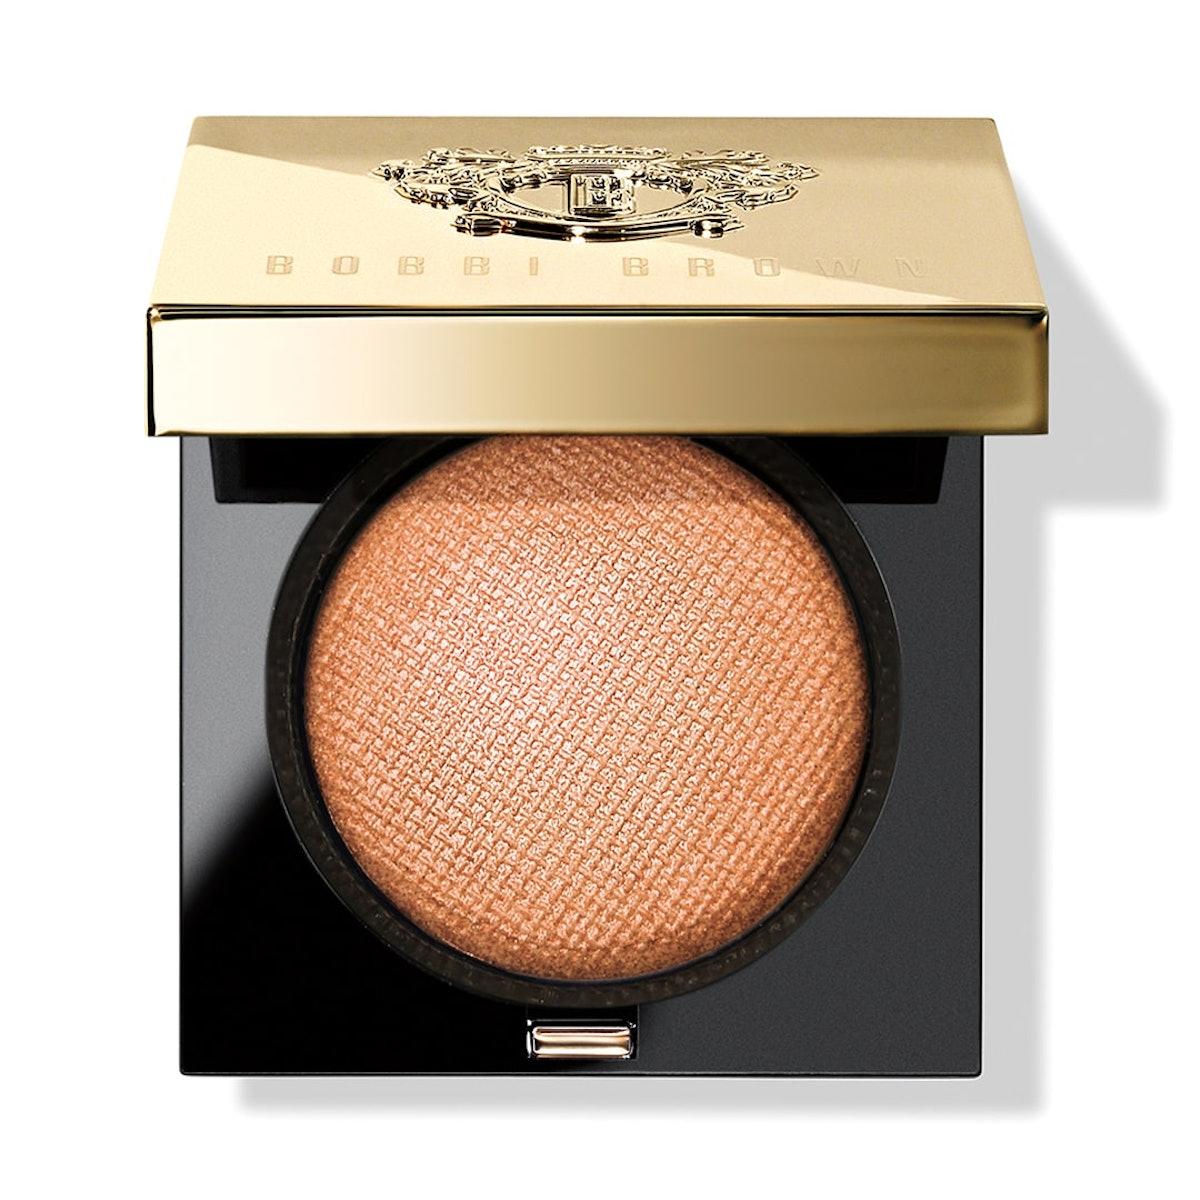 Luxe Eyeshadow in Heat Ray